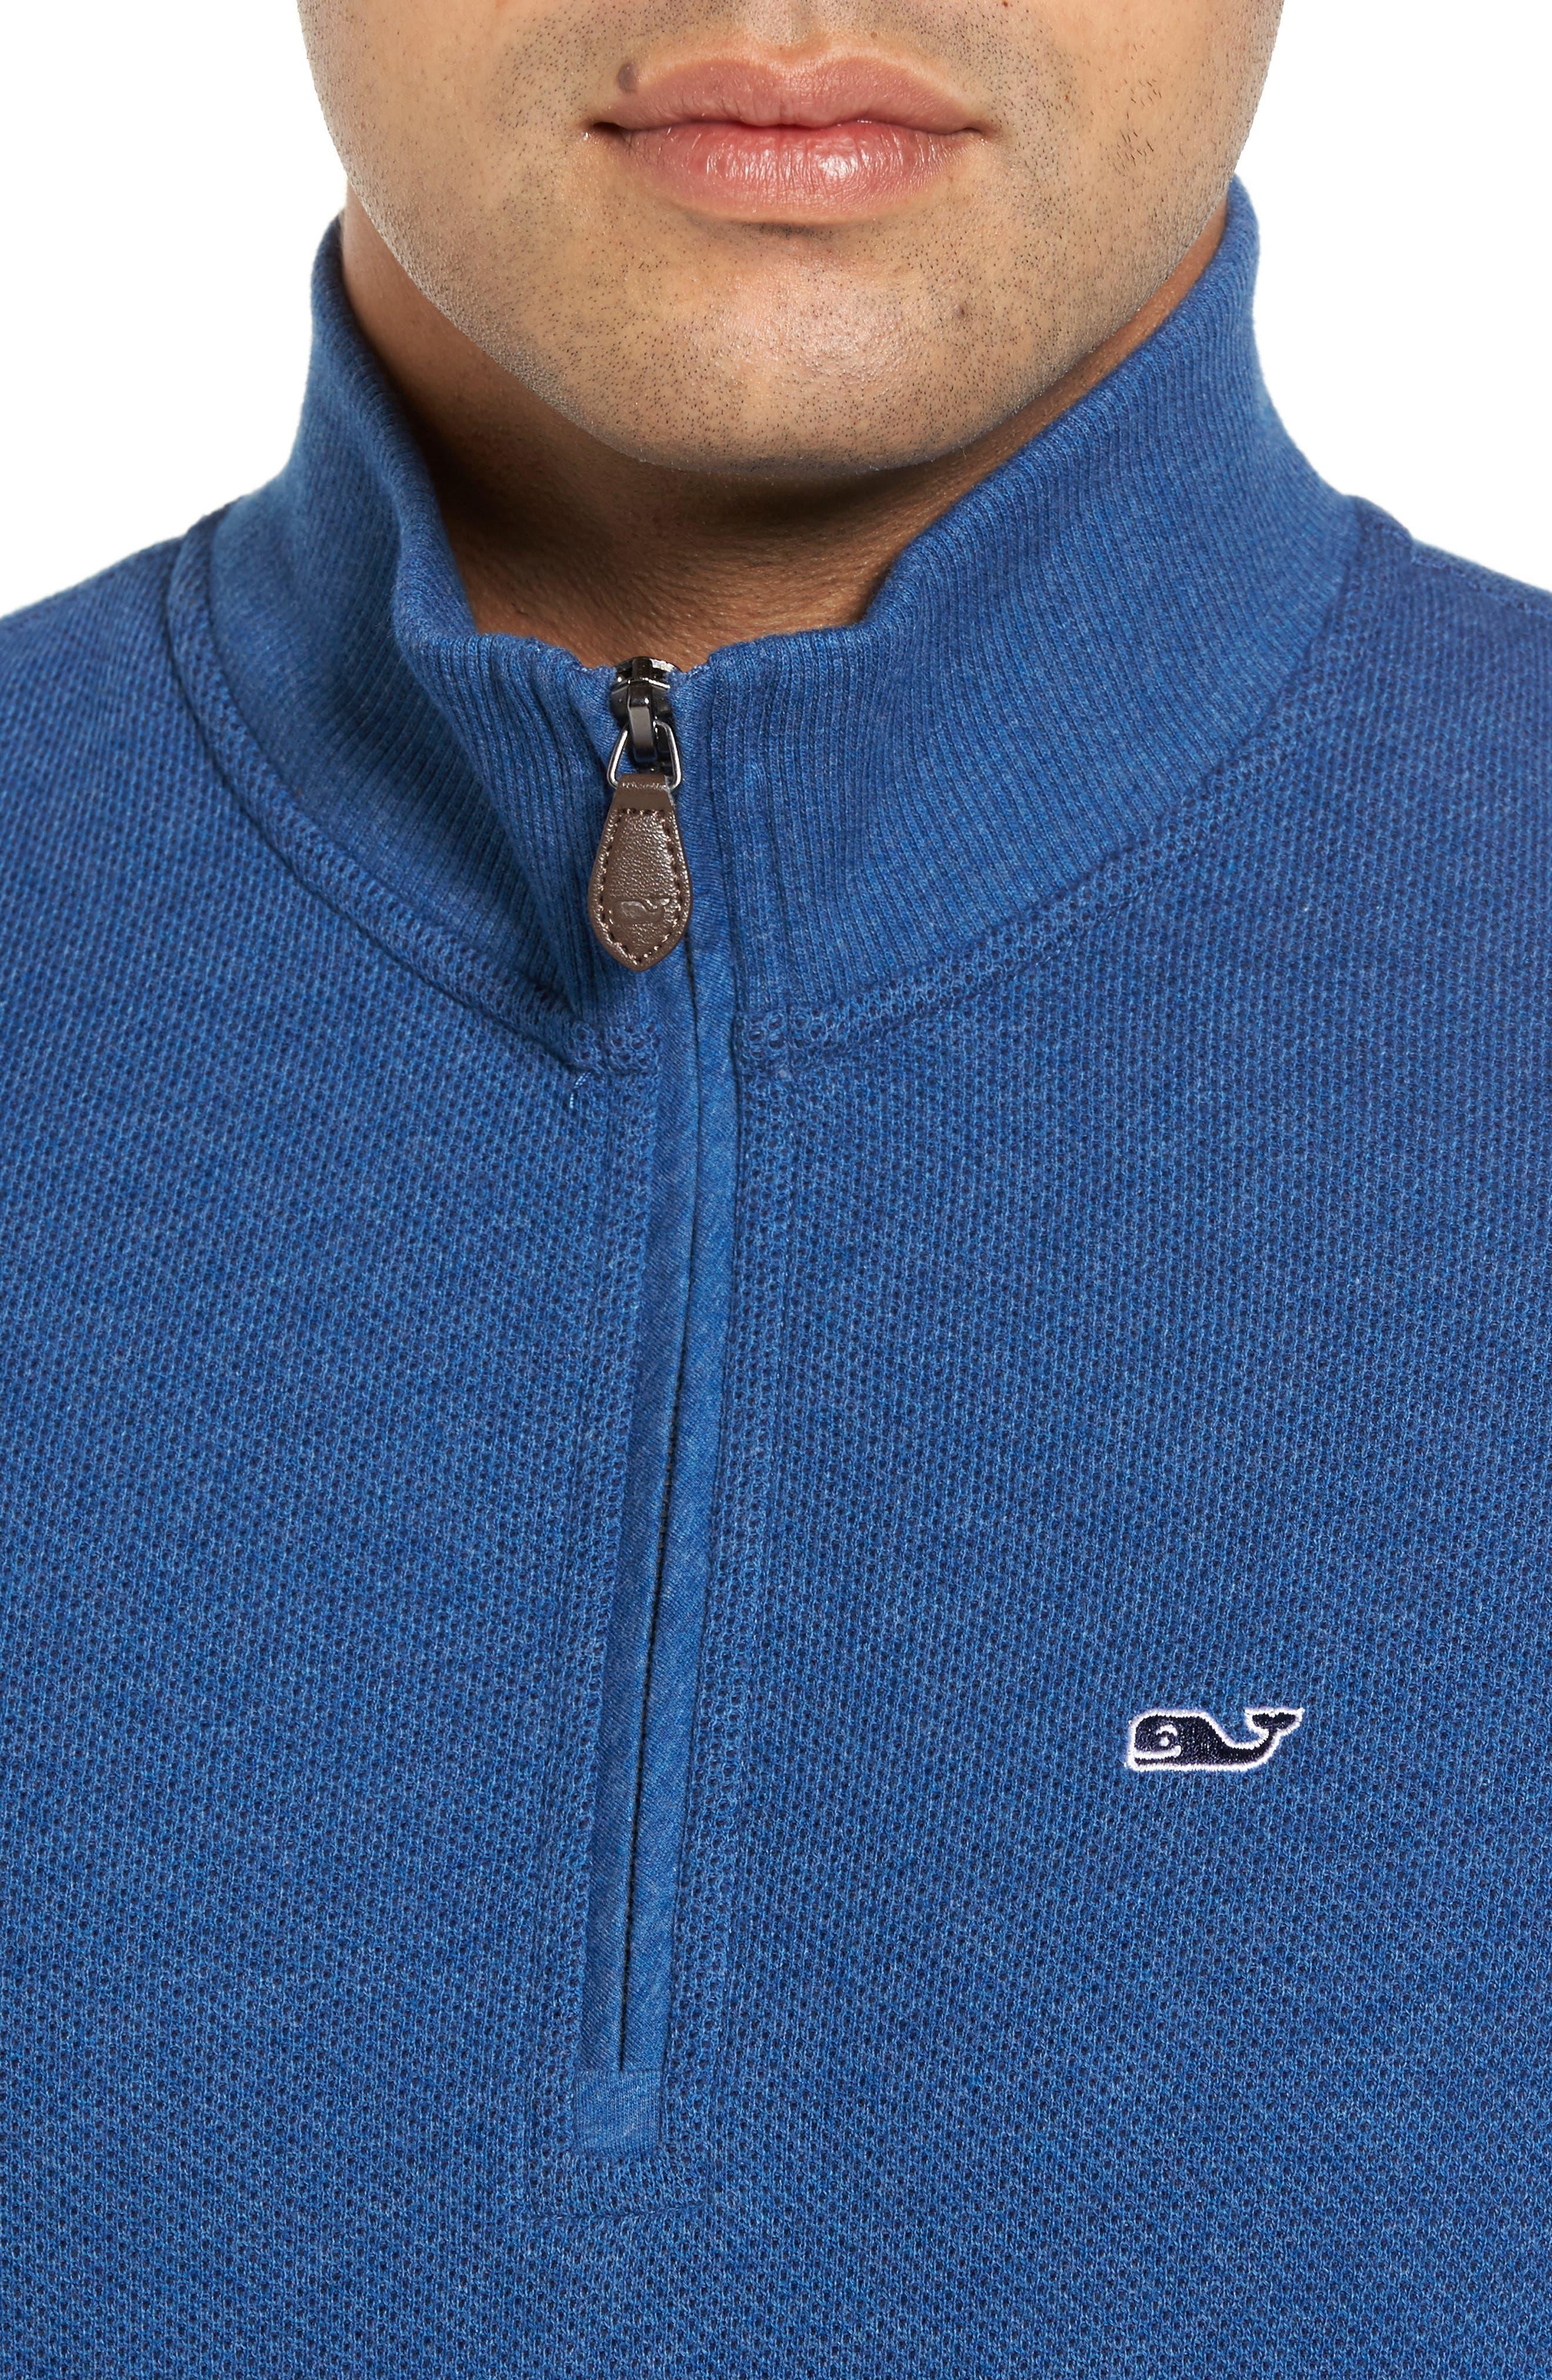 Double-Knit Quarter Zip Pullover,                             Alternate thumbnail 4, color,                             461